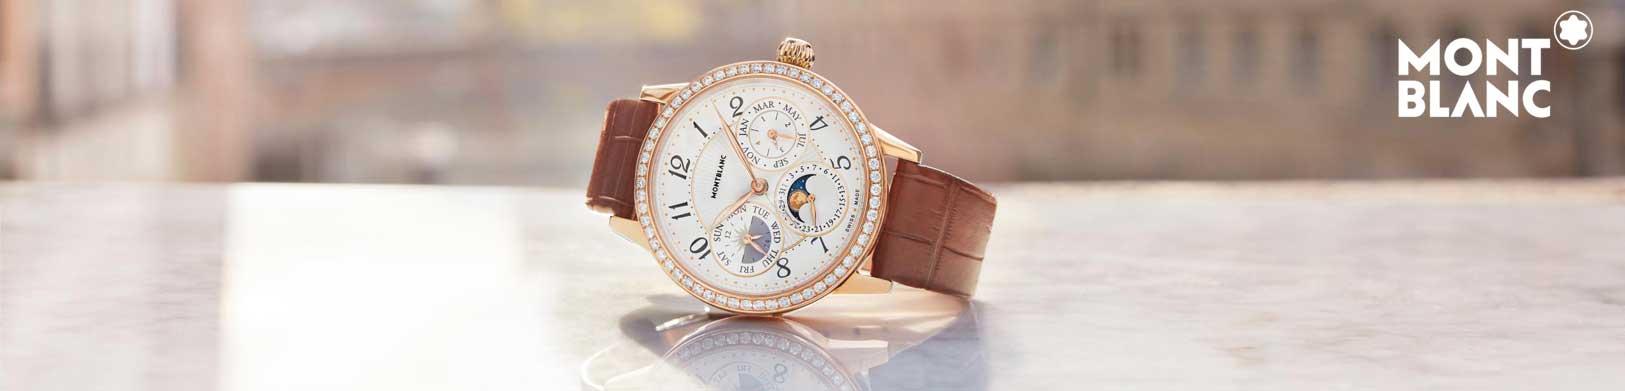 Montblanc Smartwatches